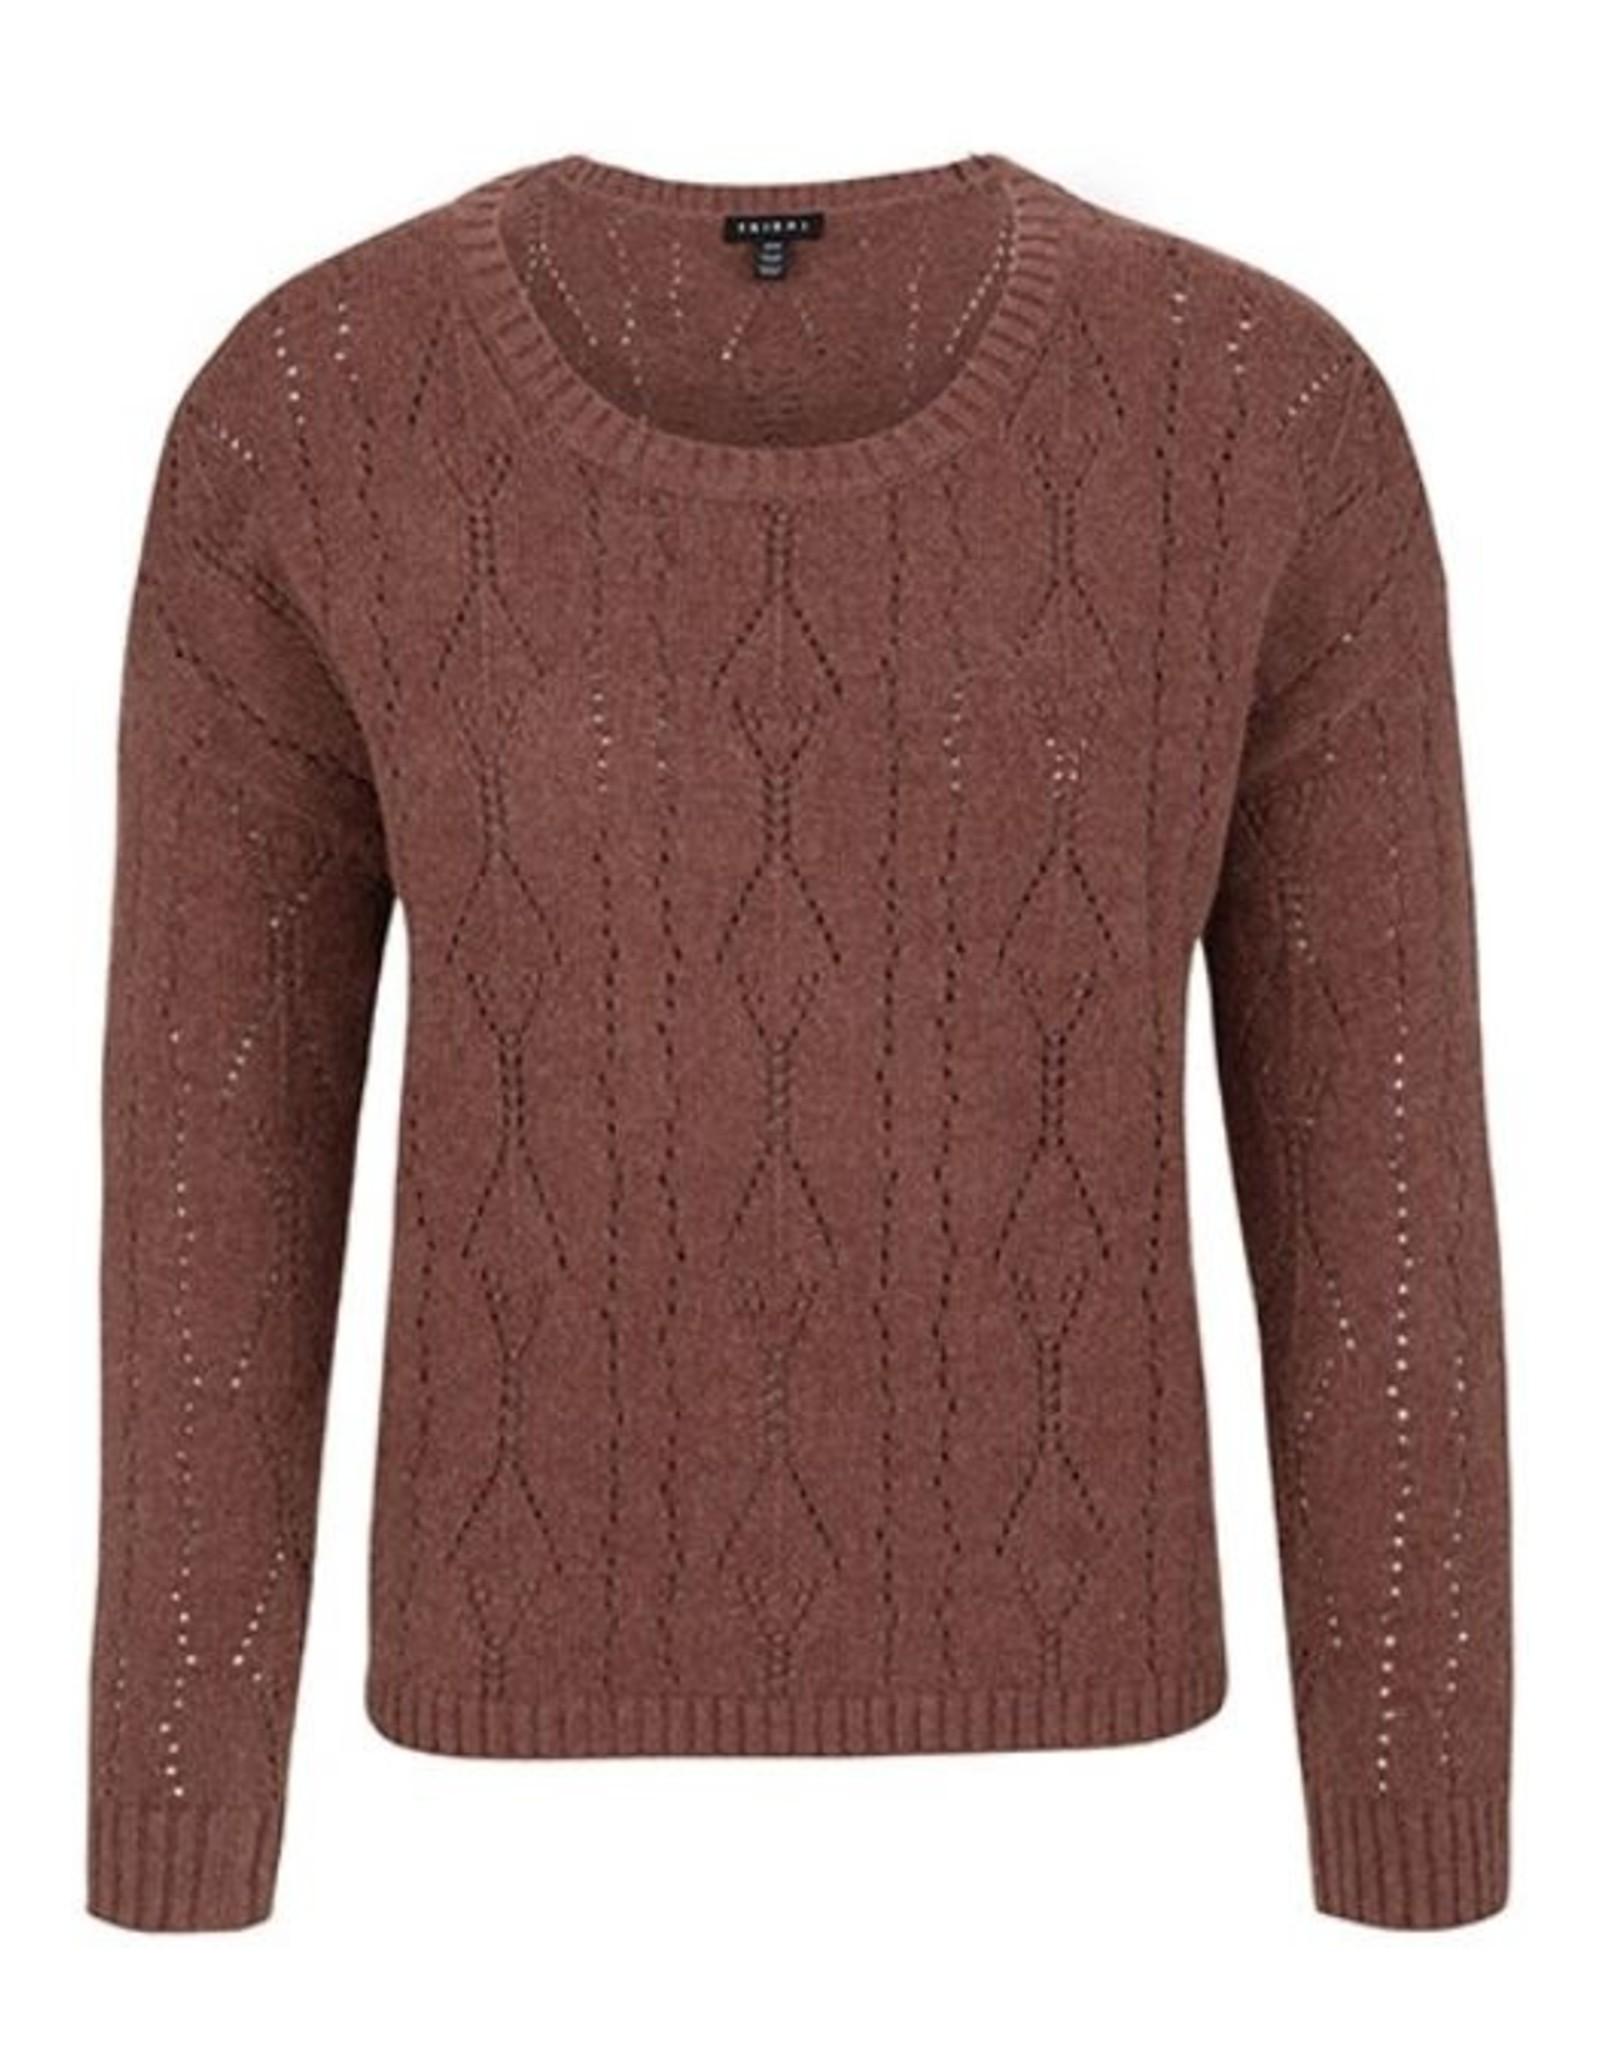 Tribal L/S Pointelle Sweater